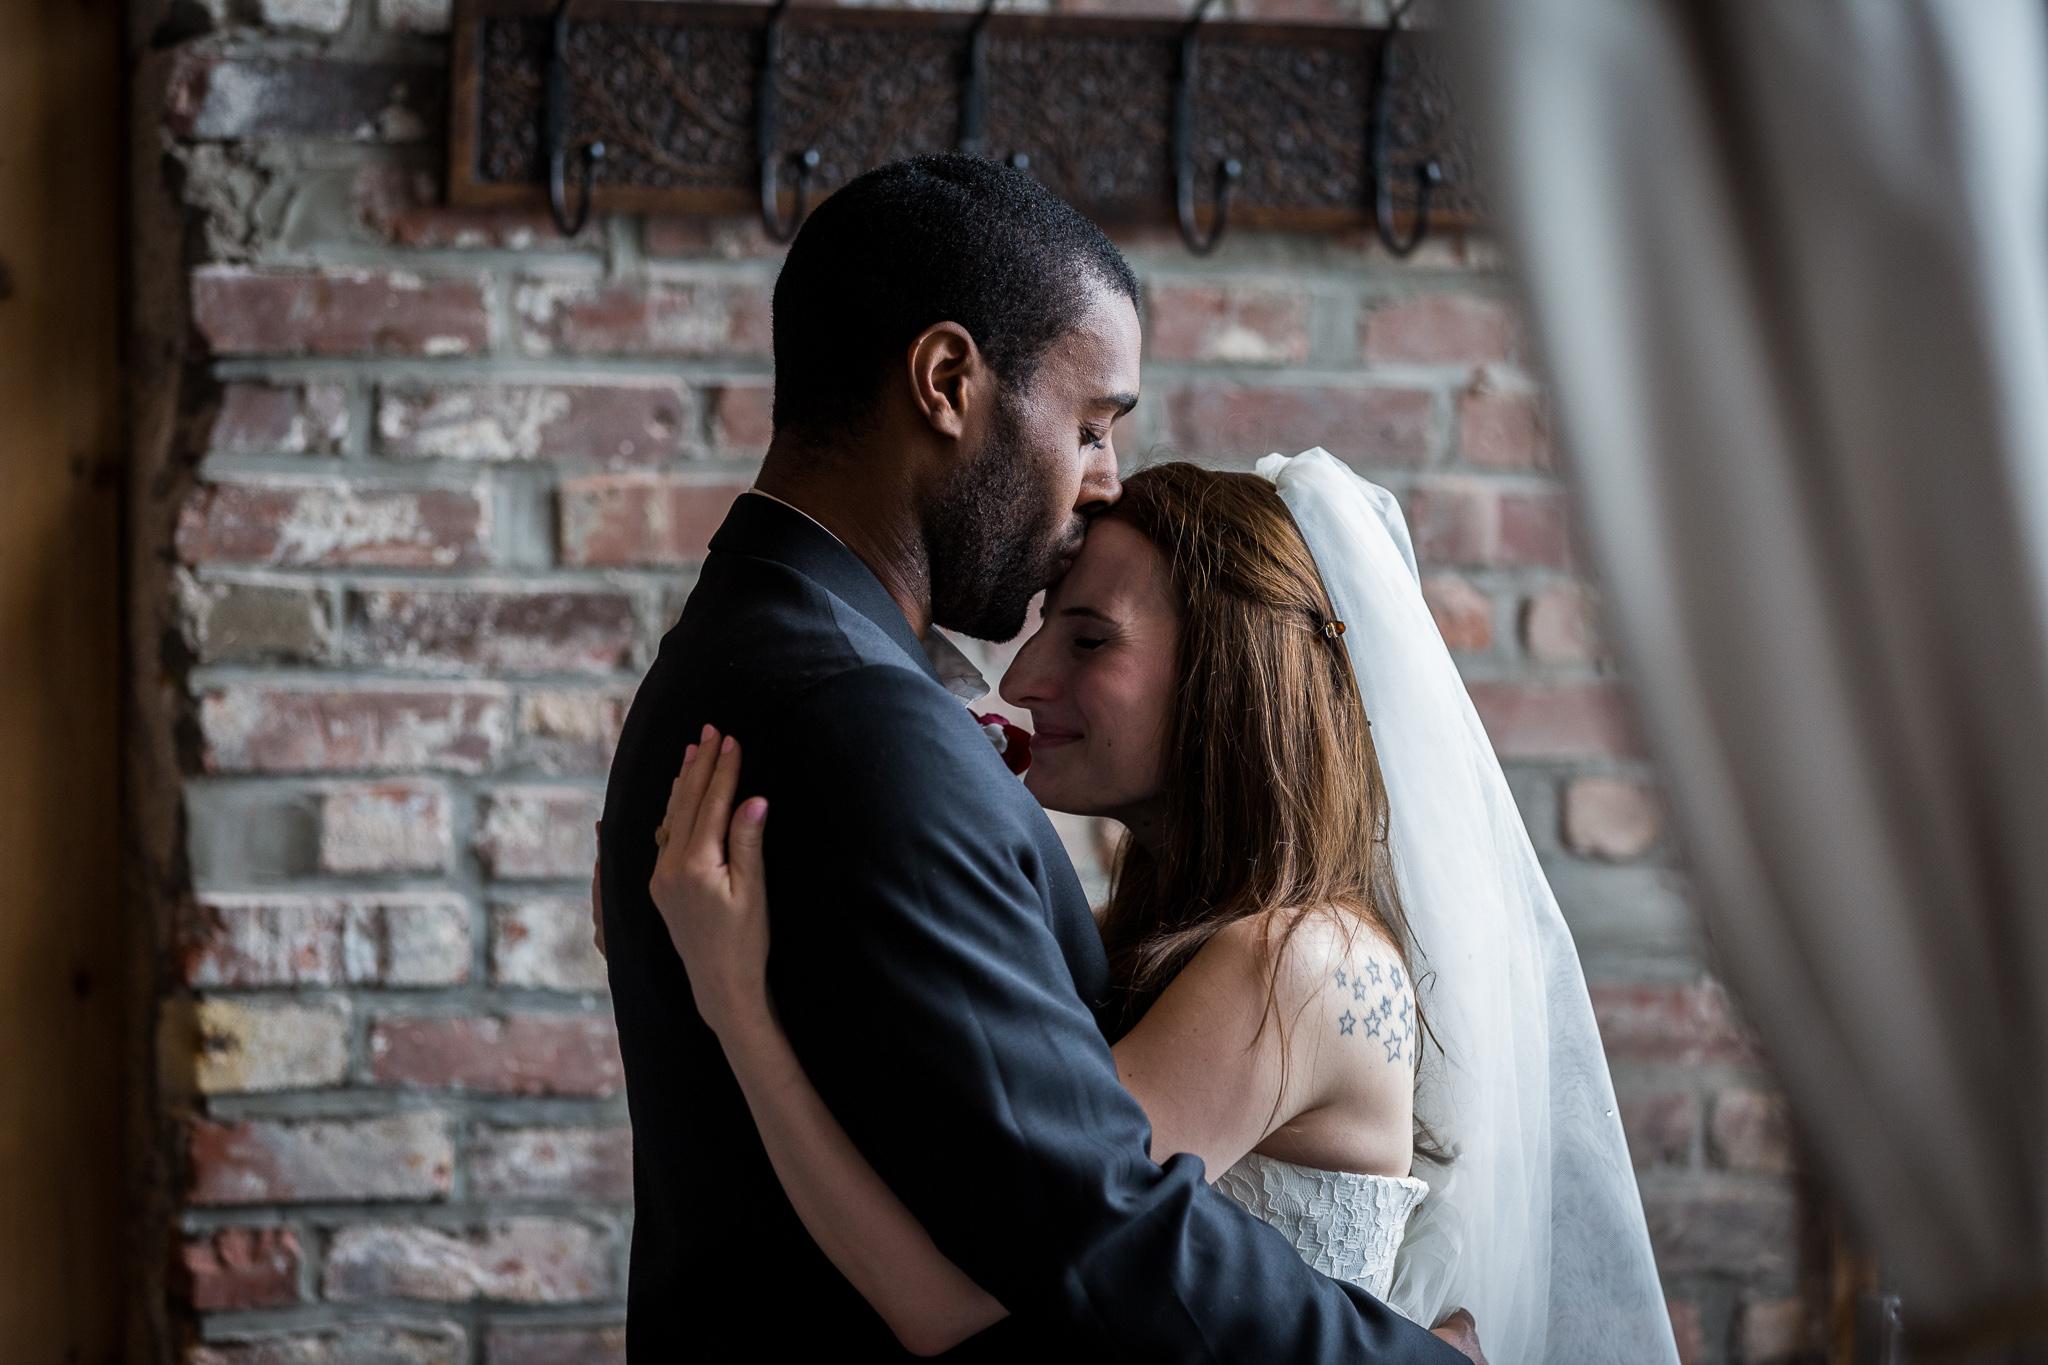 Wedding_Day_Moments_To_Do_List_15MinWedding-099.jpg